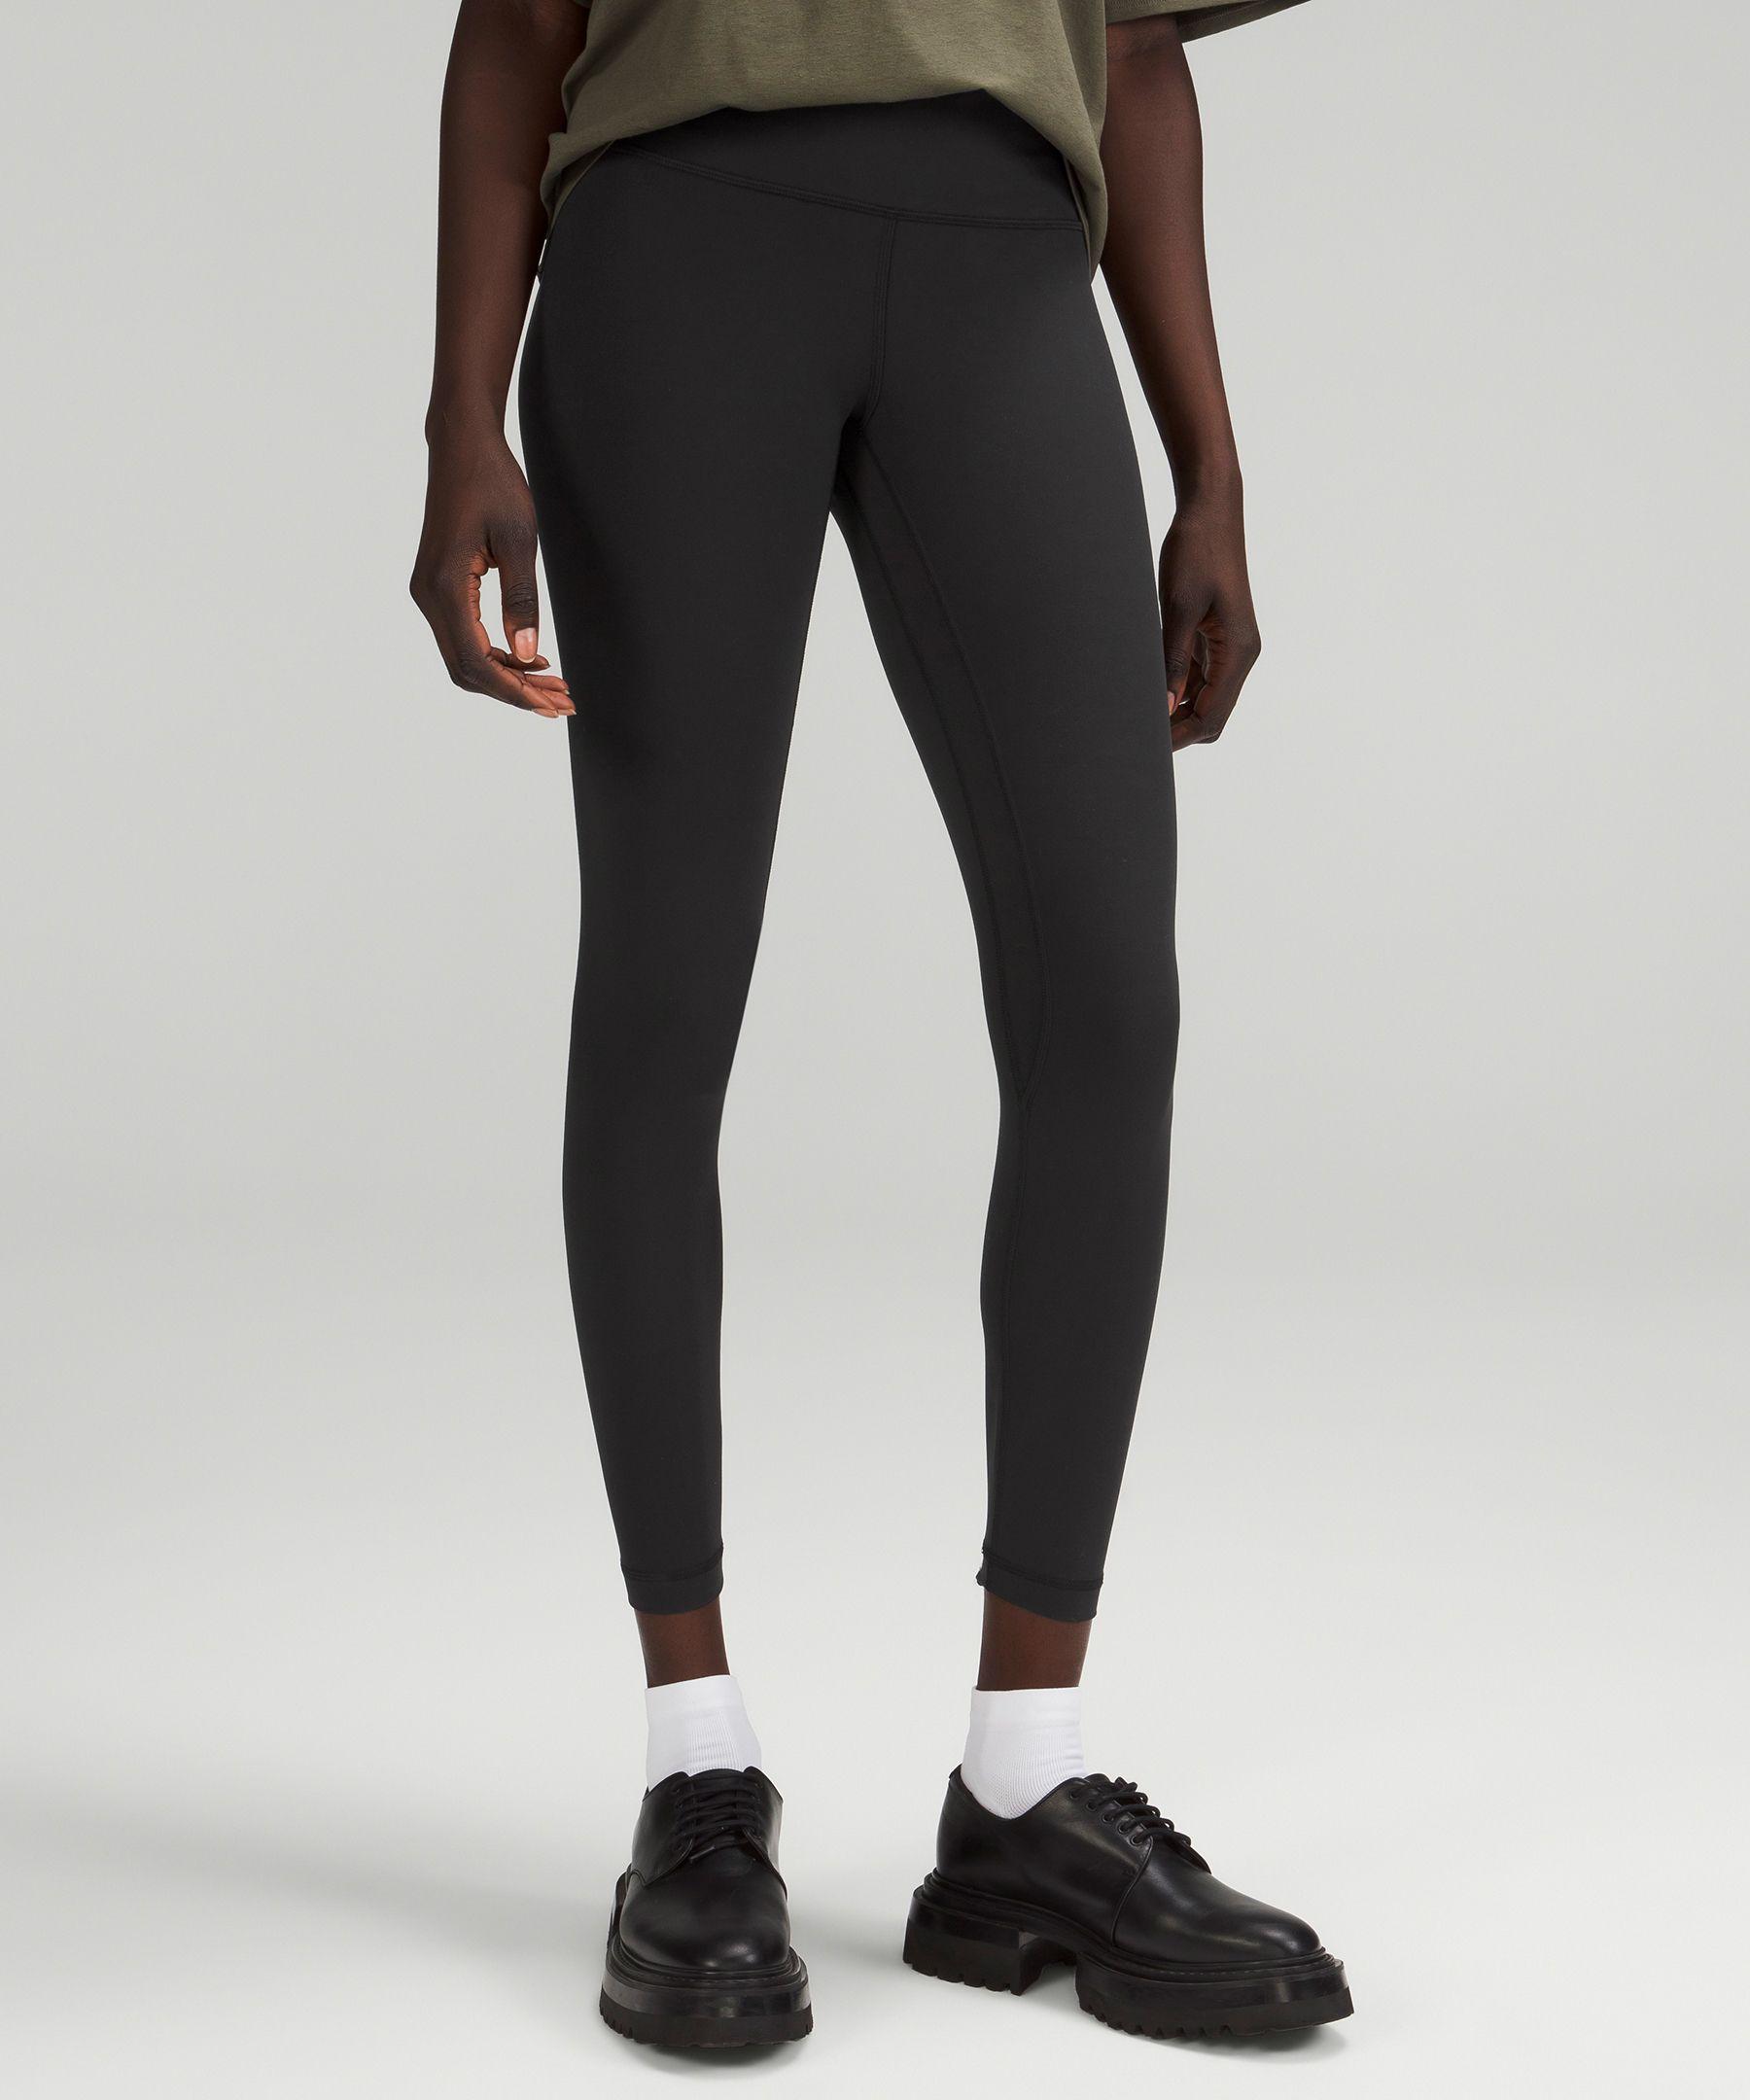 tights yoga